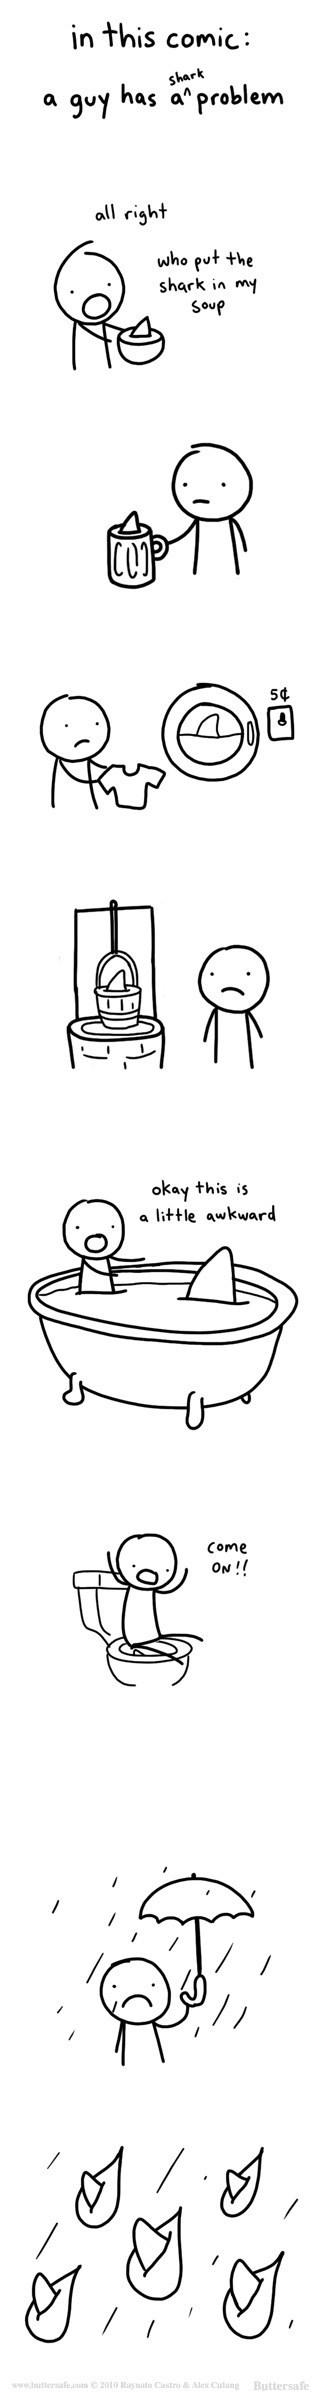 problems sharks web comics - 8008130048